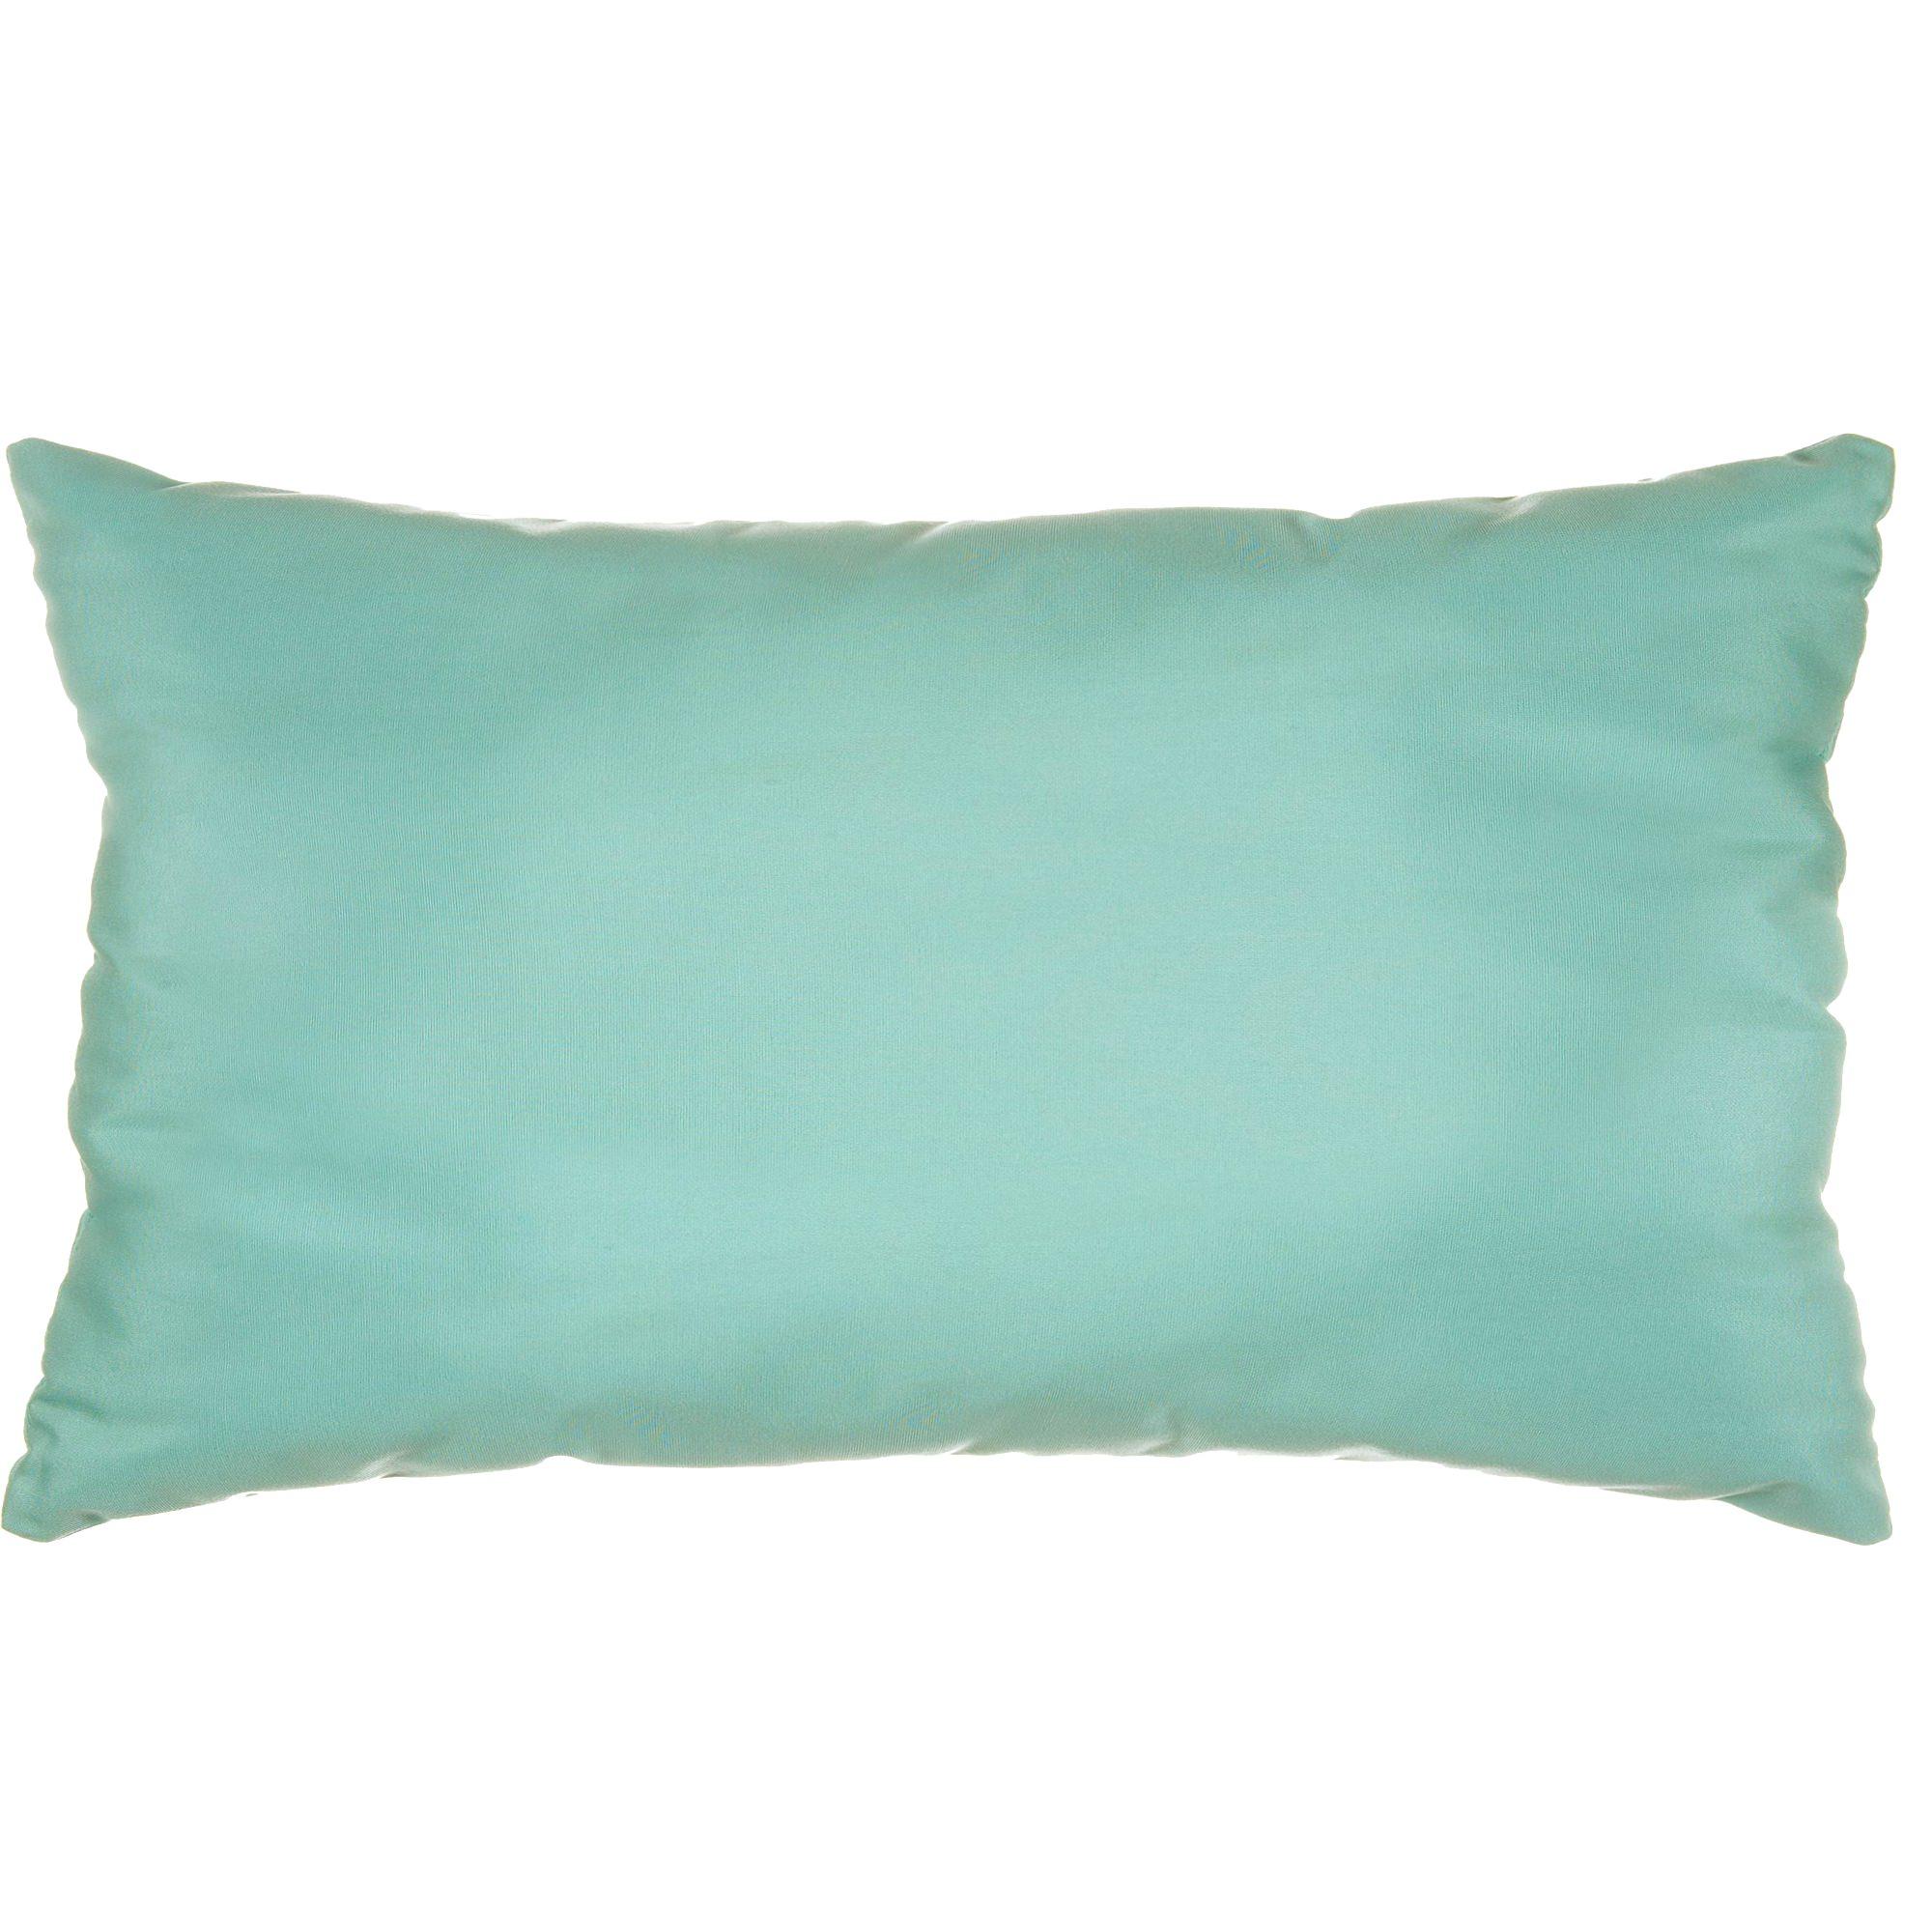 Sunbrella Outdoor Decorative Pillows : Glacier Sunbrella Outdoor Throw Pillow